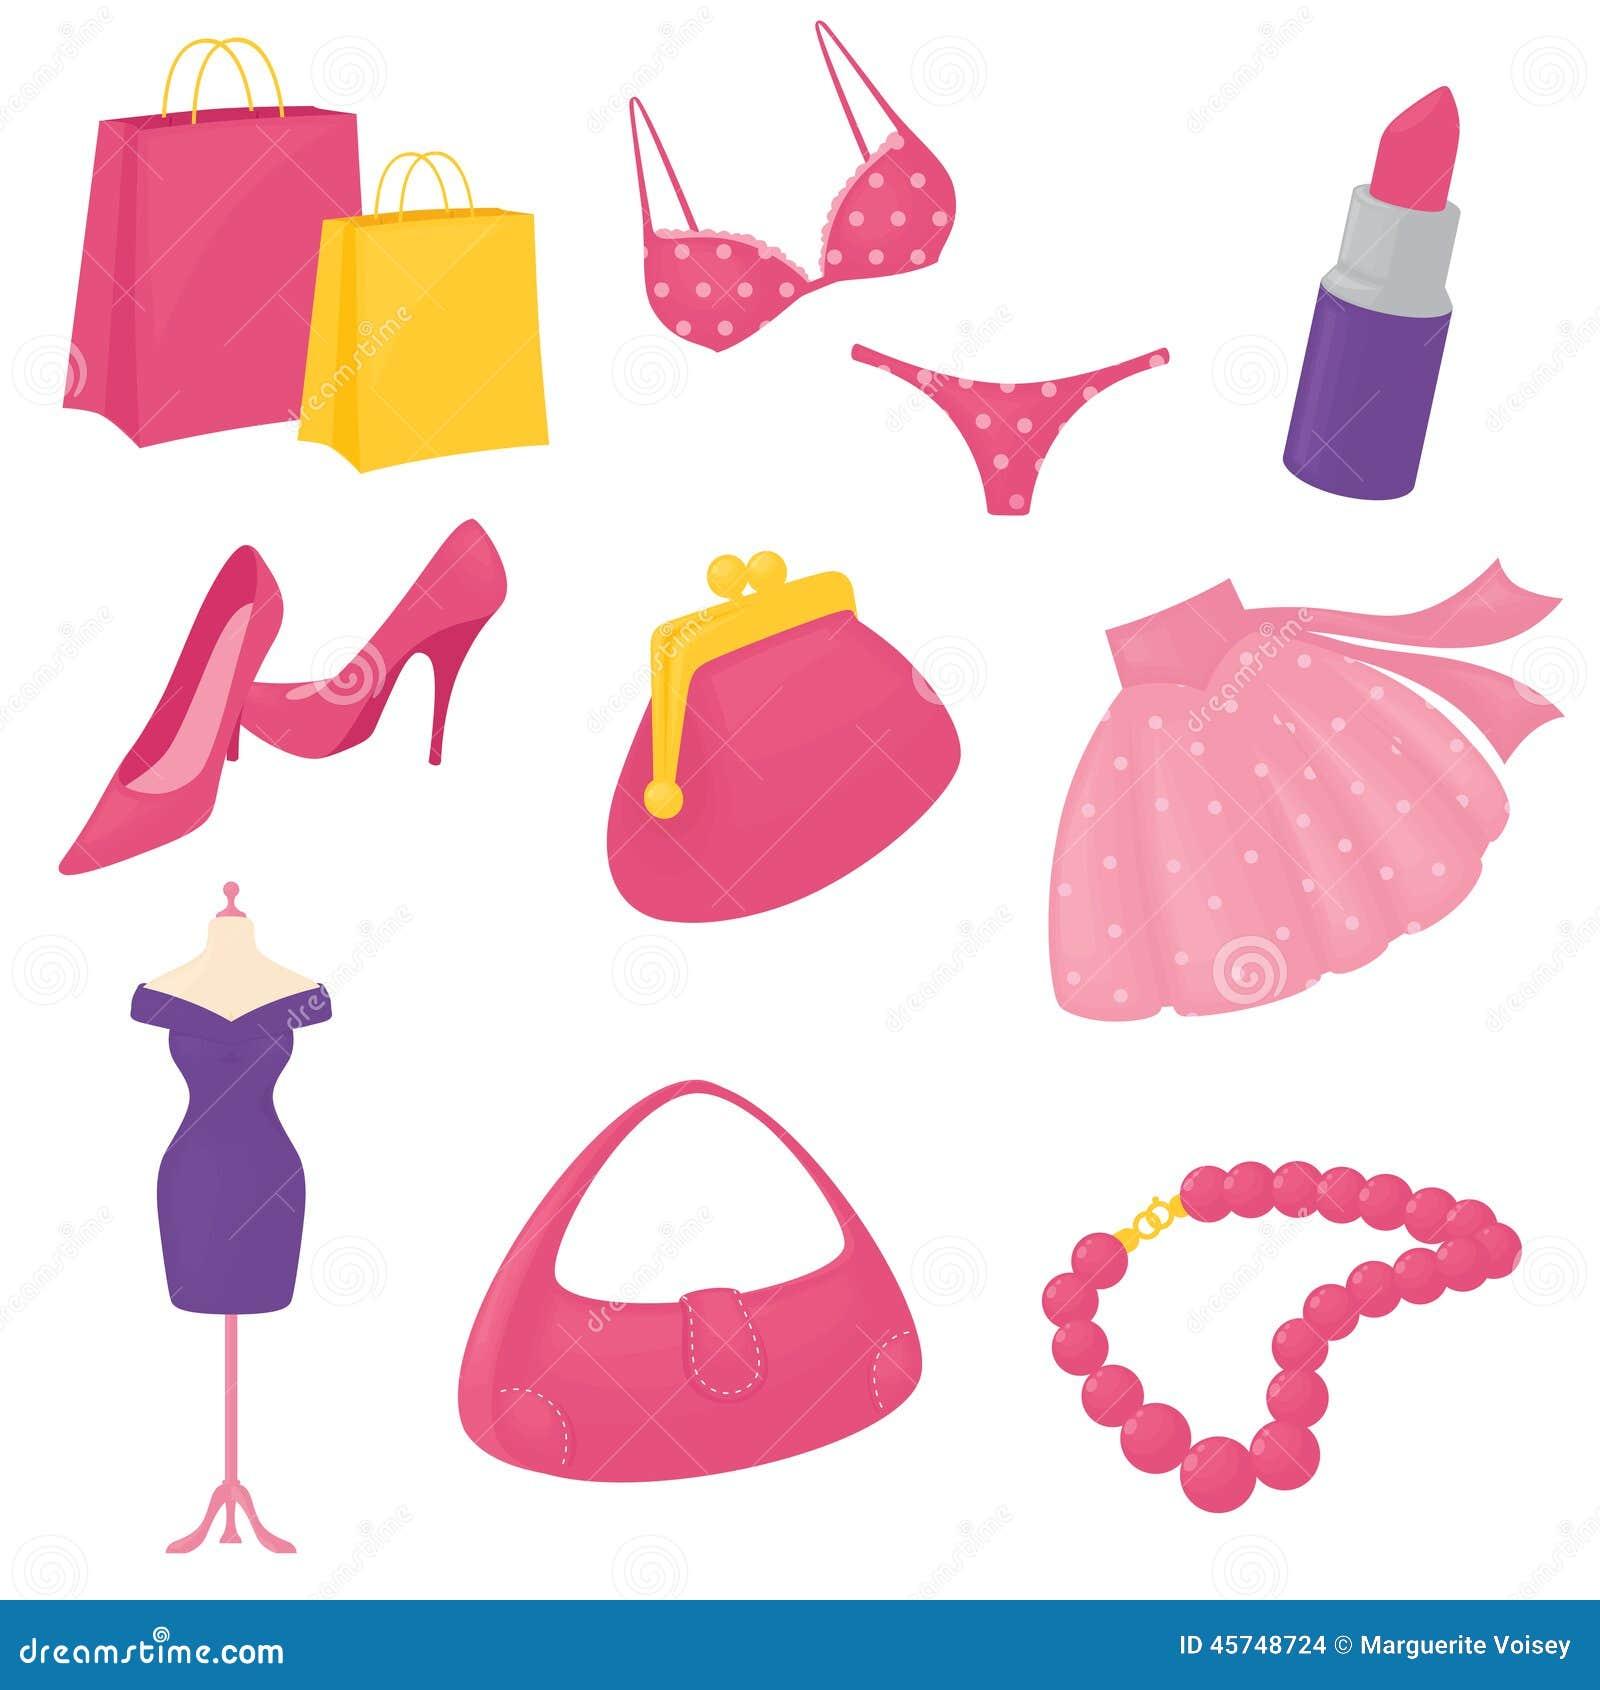 girly icons: